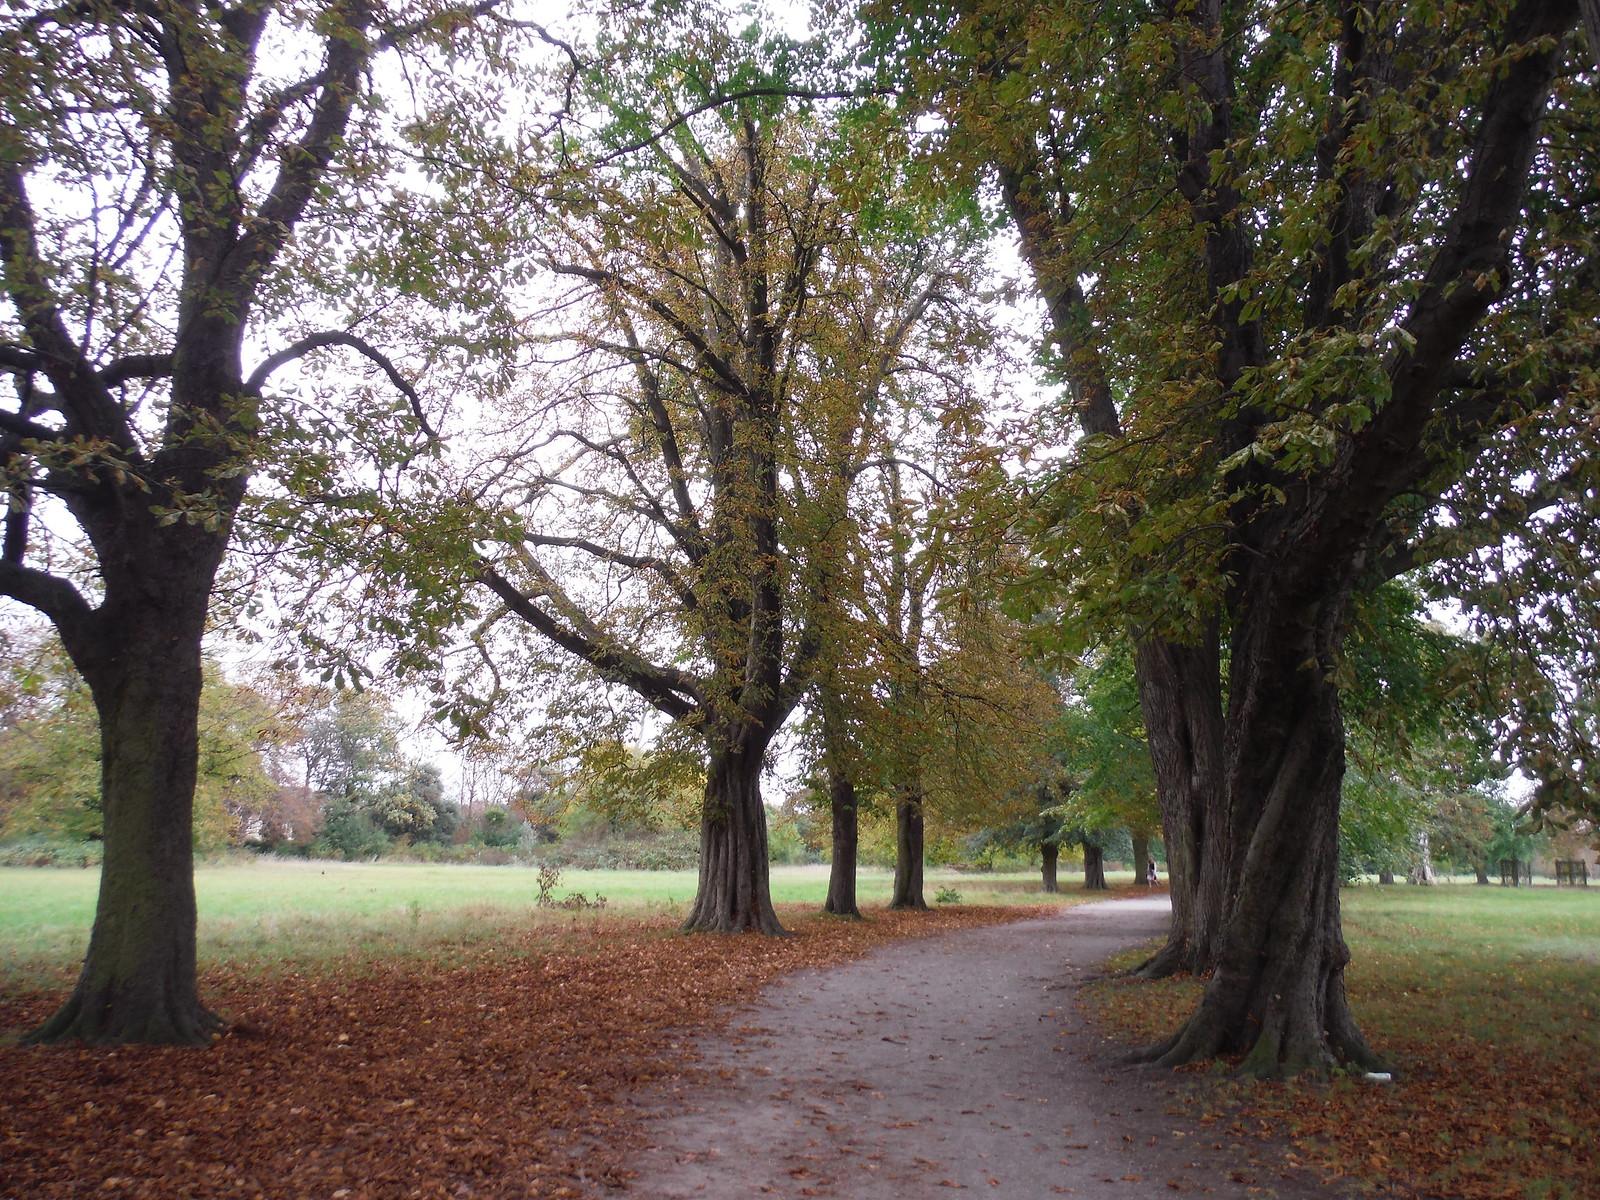 Tree Lined Avenue, Morden Hall Park SWC Walk Short 13 - Morden Hall Park and Merton Abbey Mills